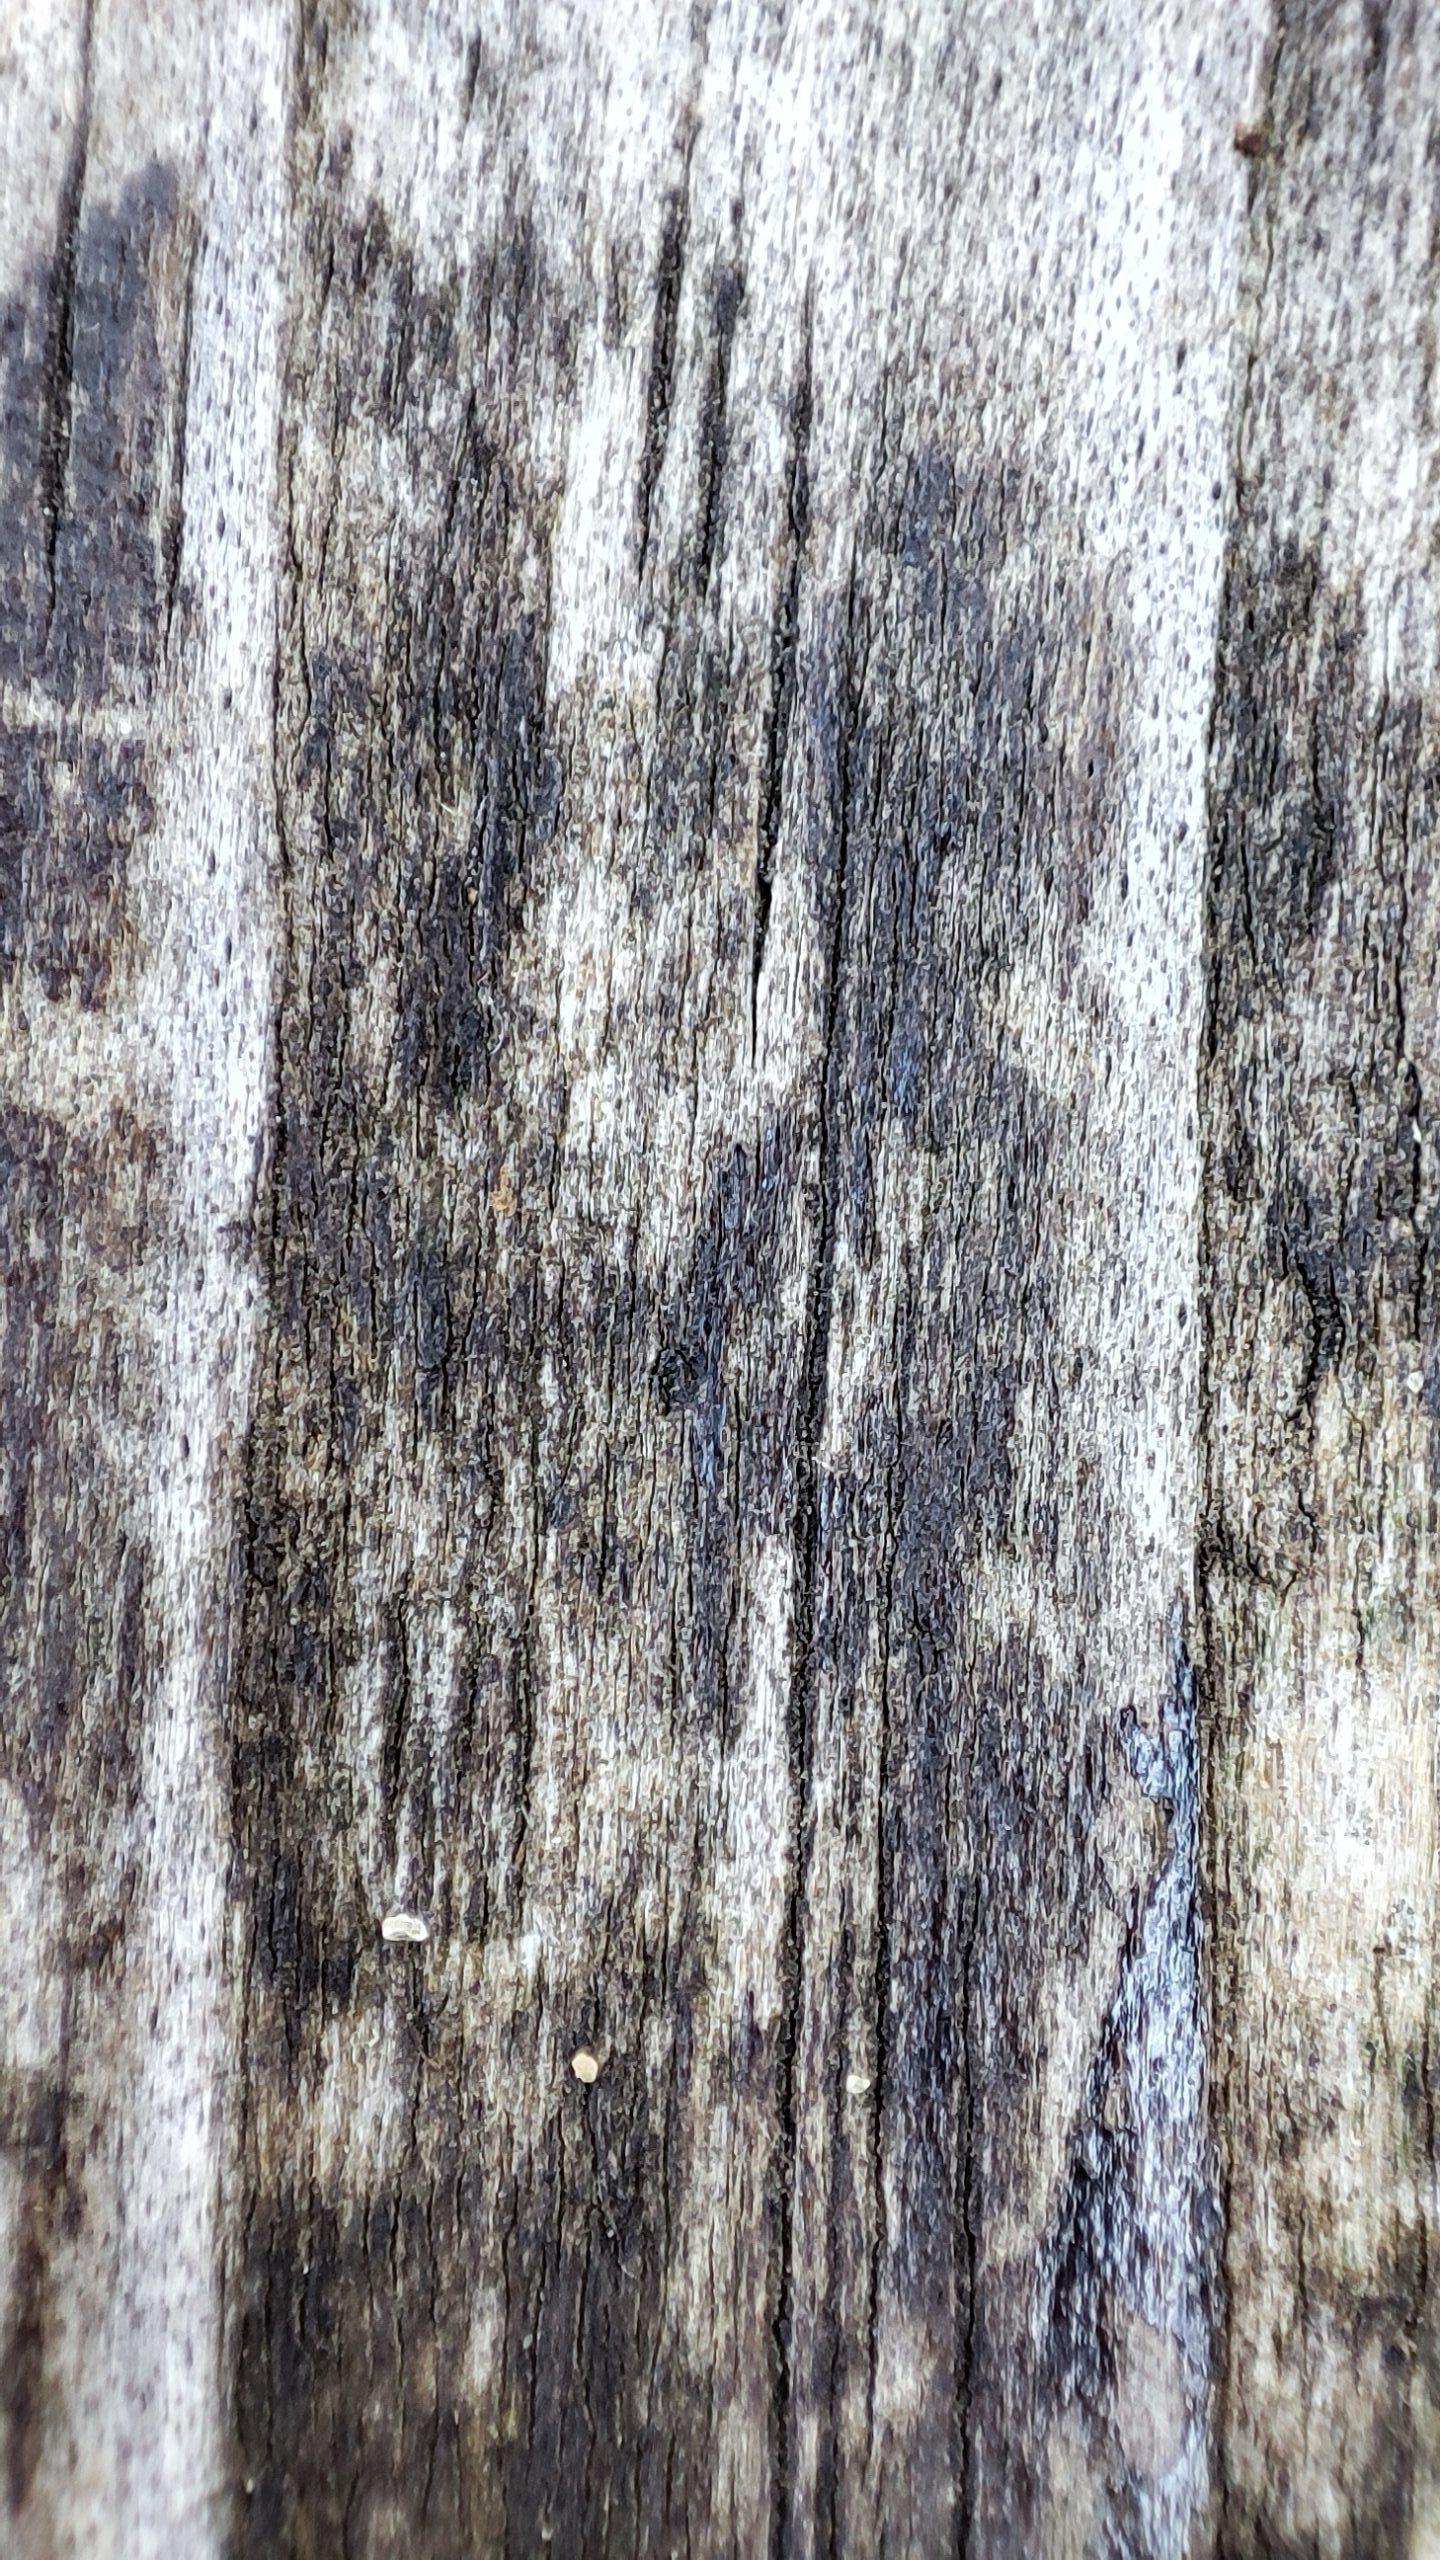 xiaomi 11t pro makro drewno